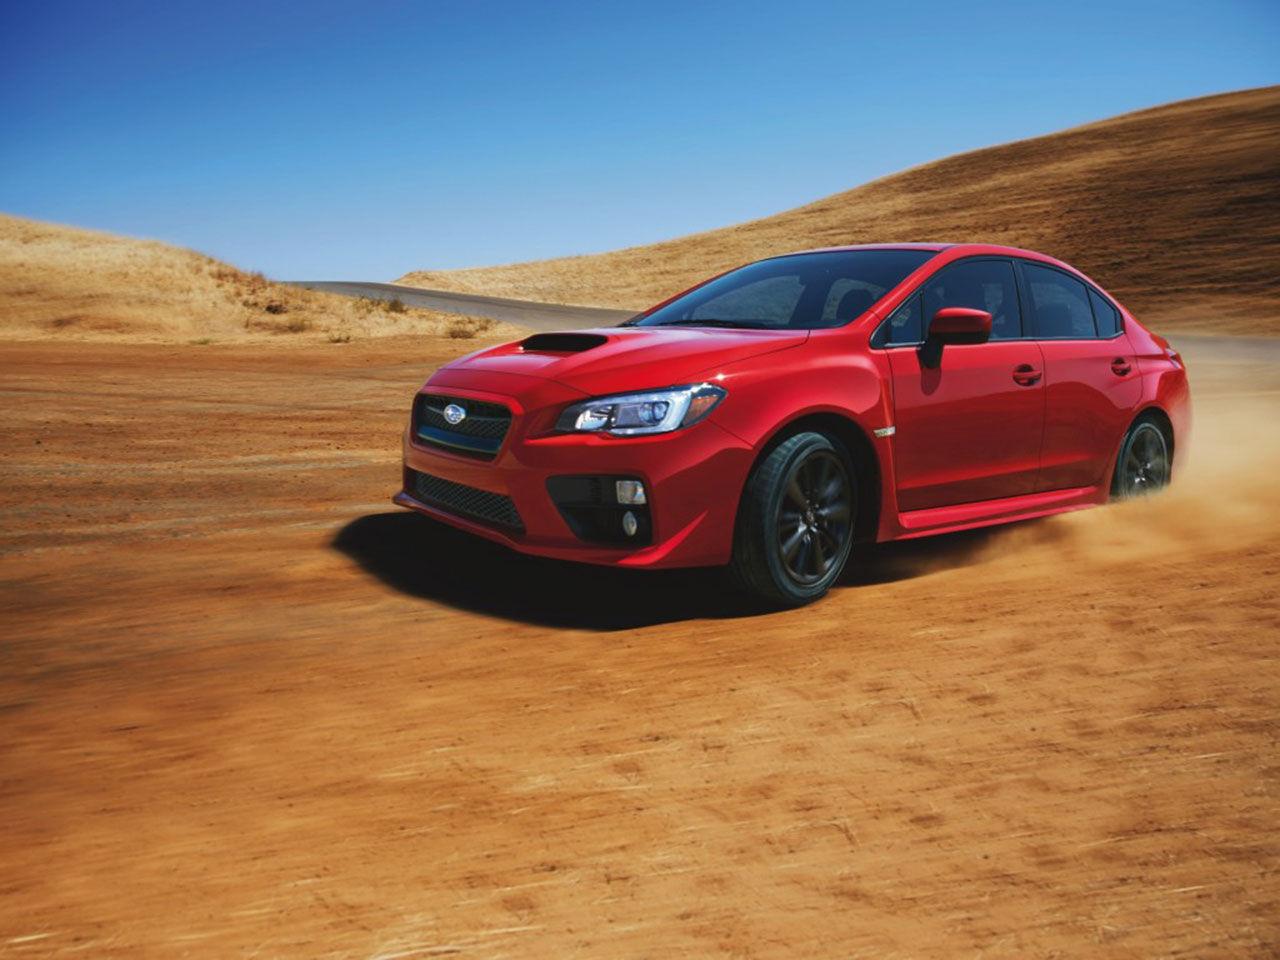 Nya Subaru Impreza WRX presenterad